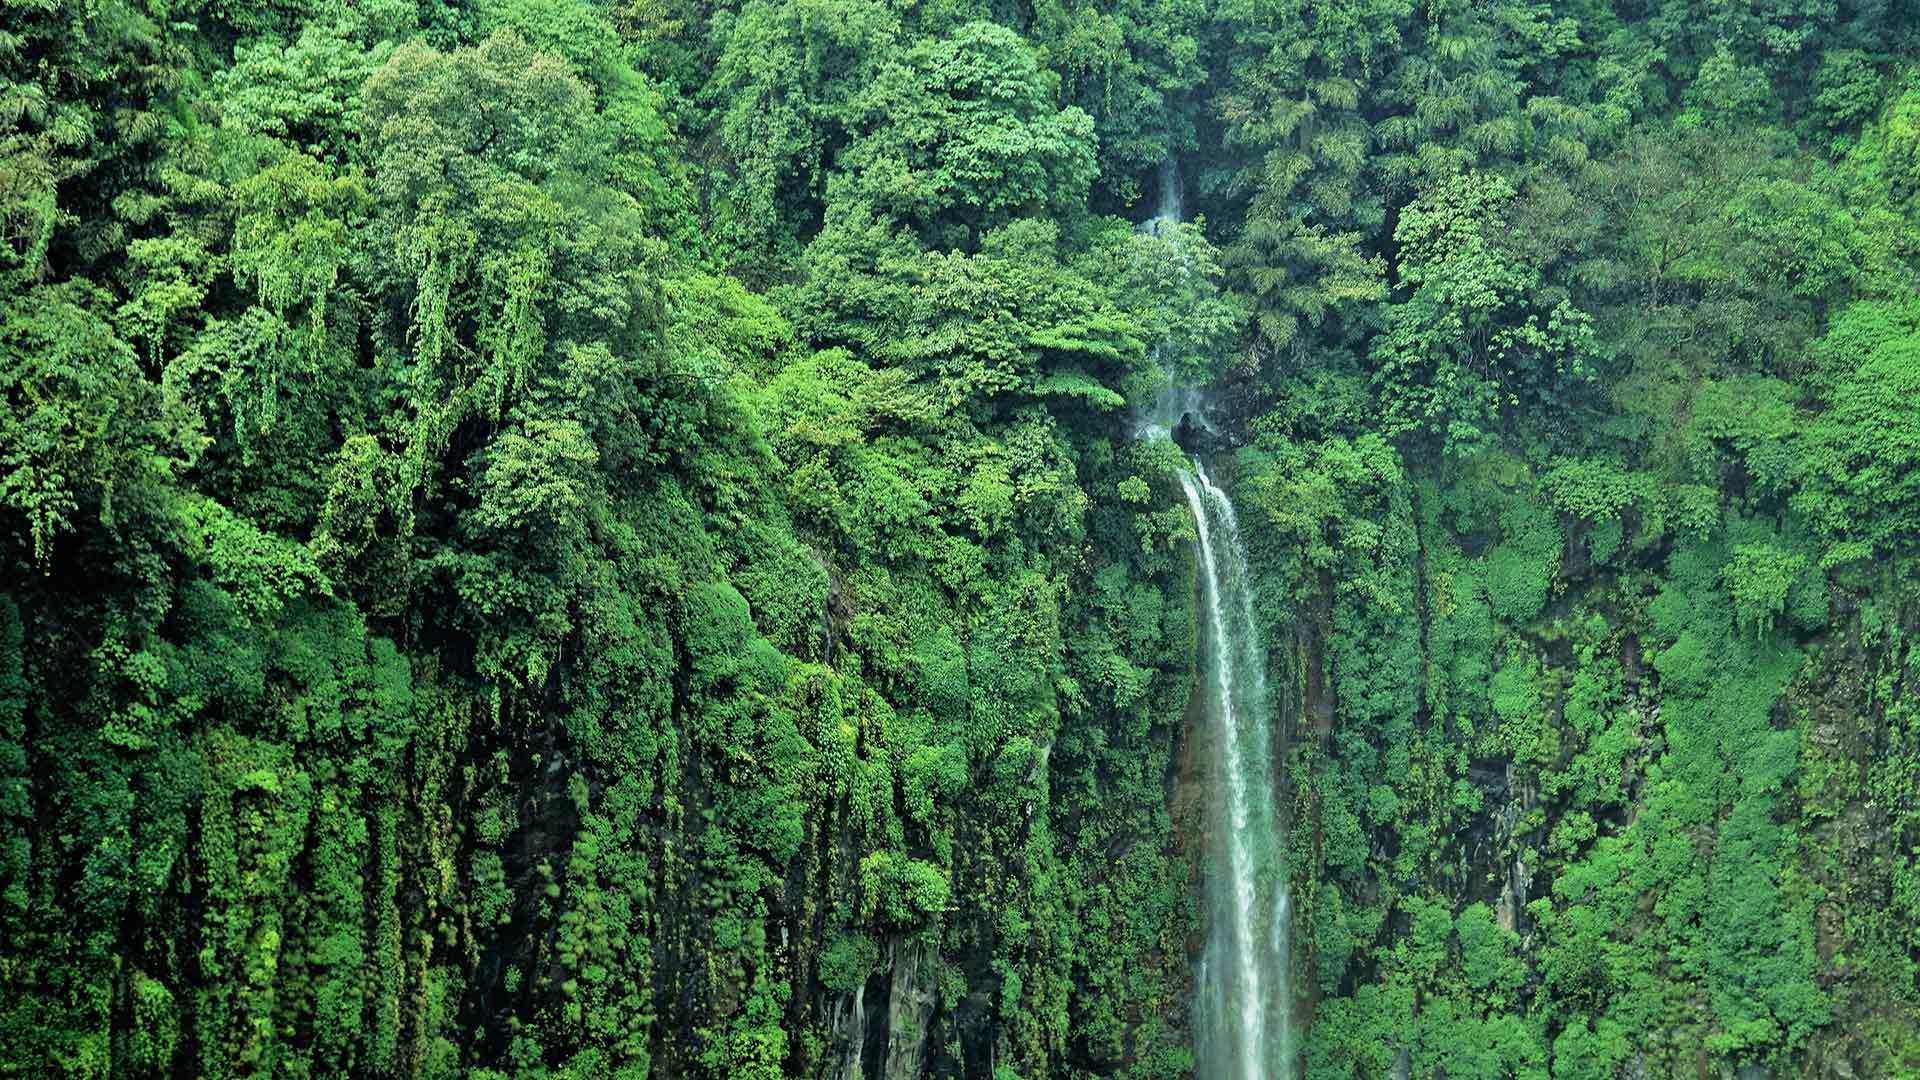 Cascade Thoseghar dans le Maharashtra, Inde (© Sonali Kumar/iStock/Getty Images Plus)(Bing France)